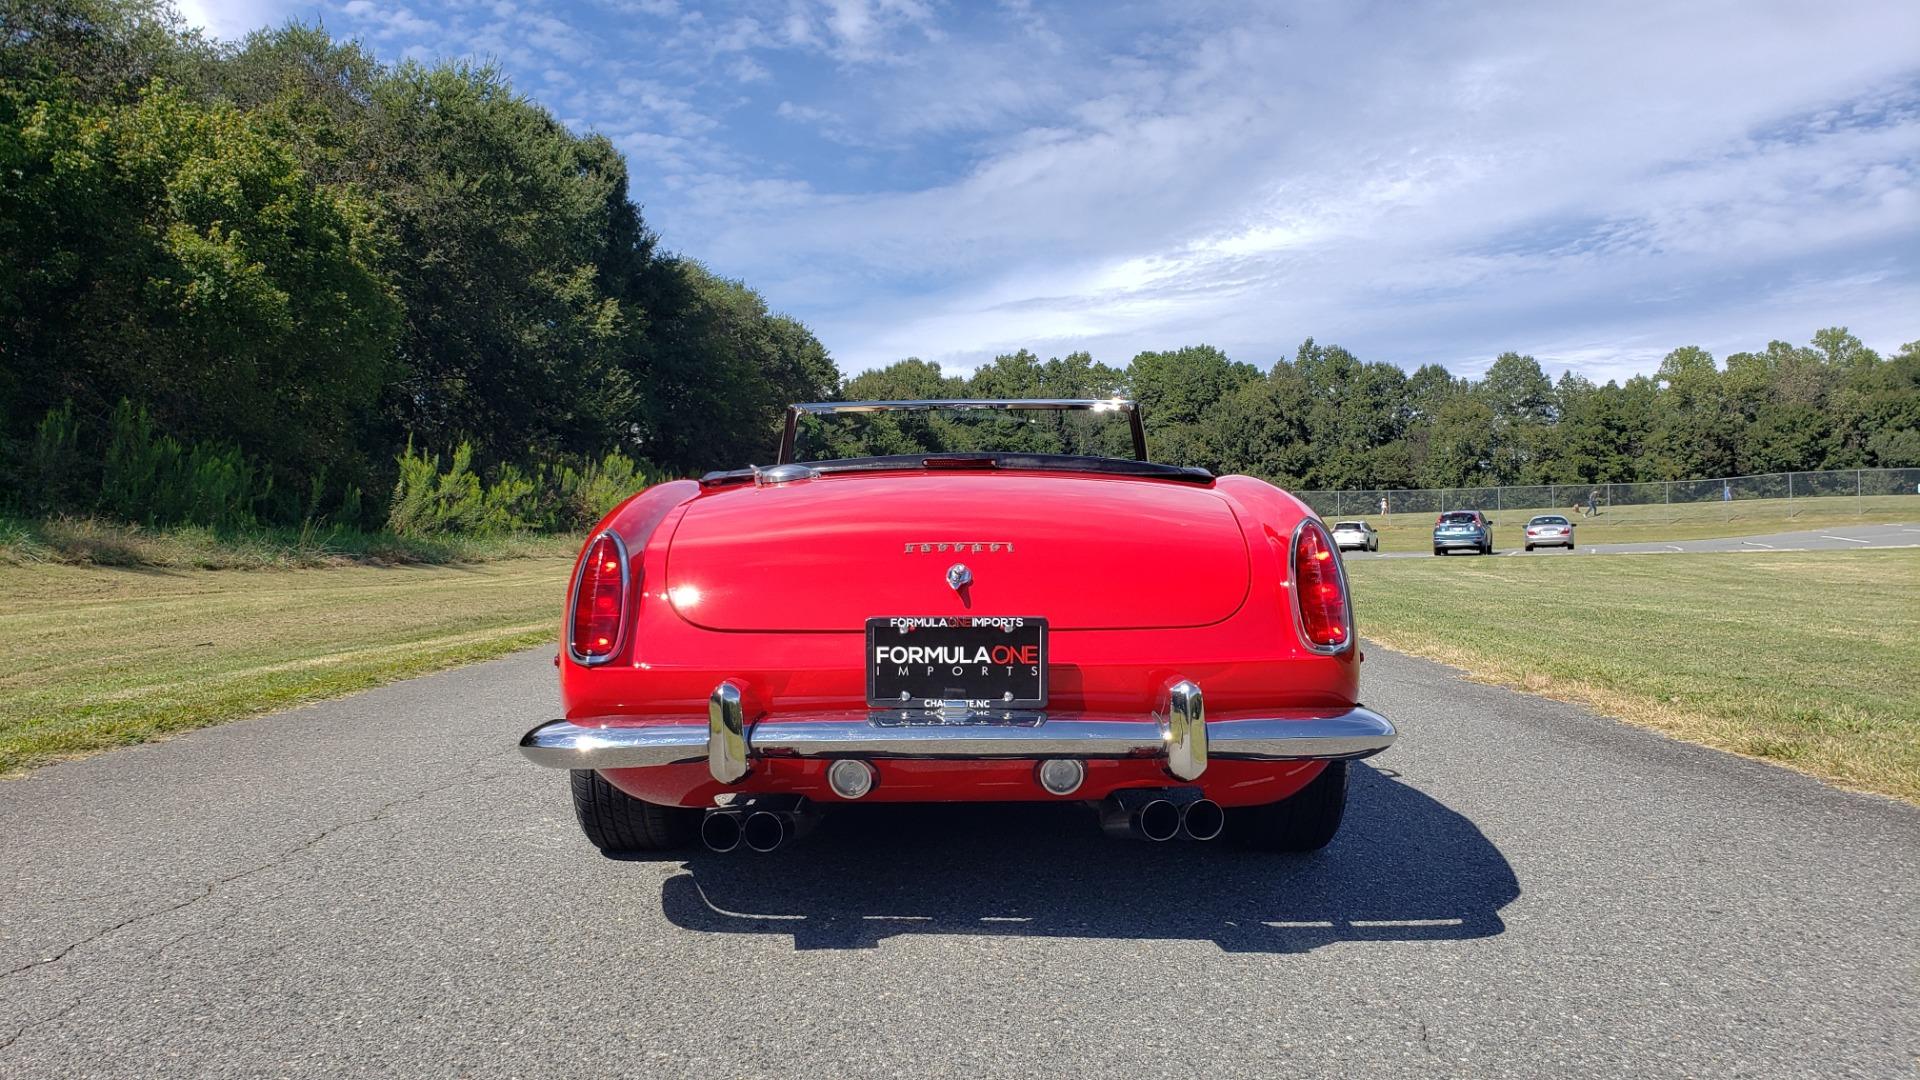 Used 1961 Ferrari 250GT SWB CALIFORNIA REPLICA / 302CI V8 / TREMEC 5-SPEED for sale Sold at Formula Imports in Charlotte NC 28227 50